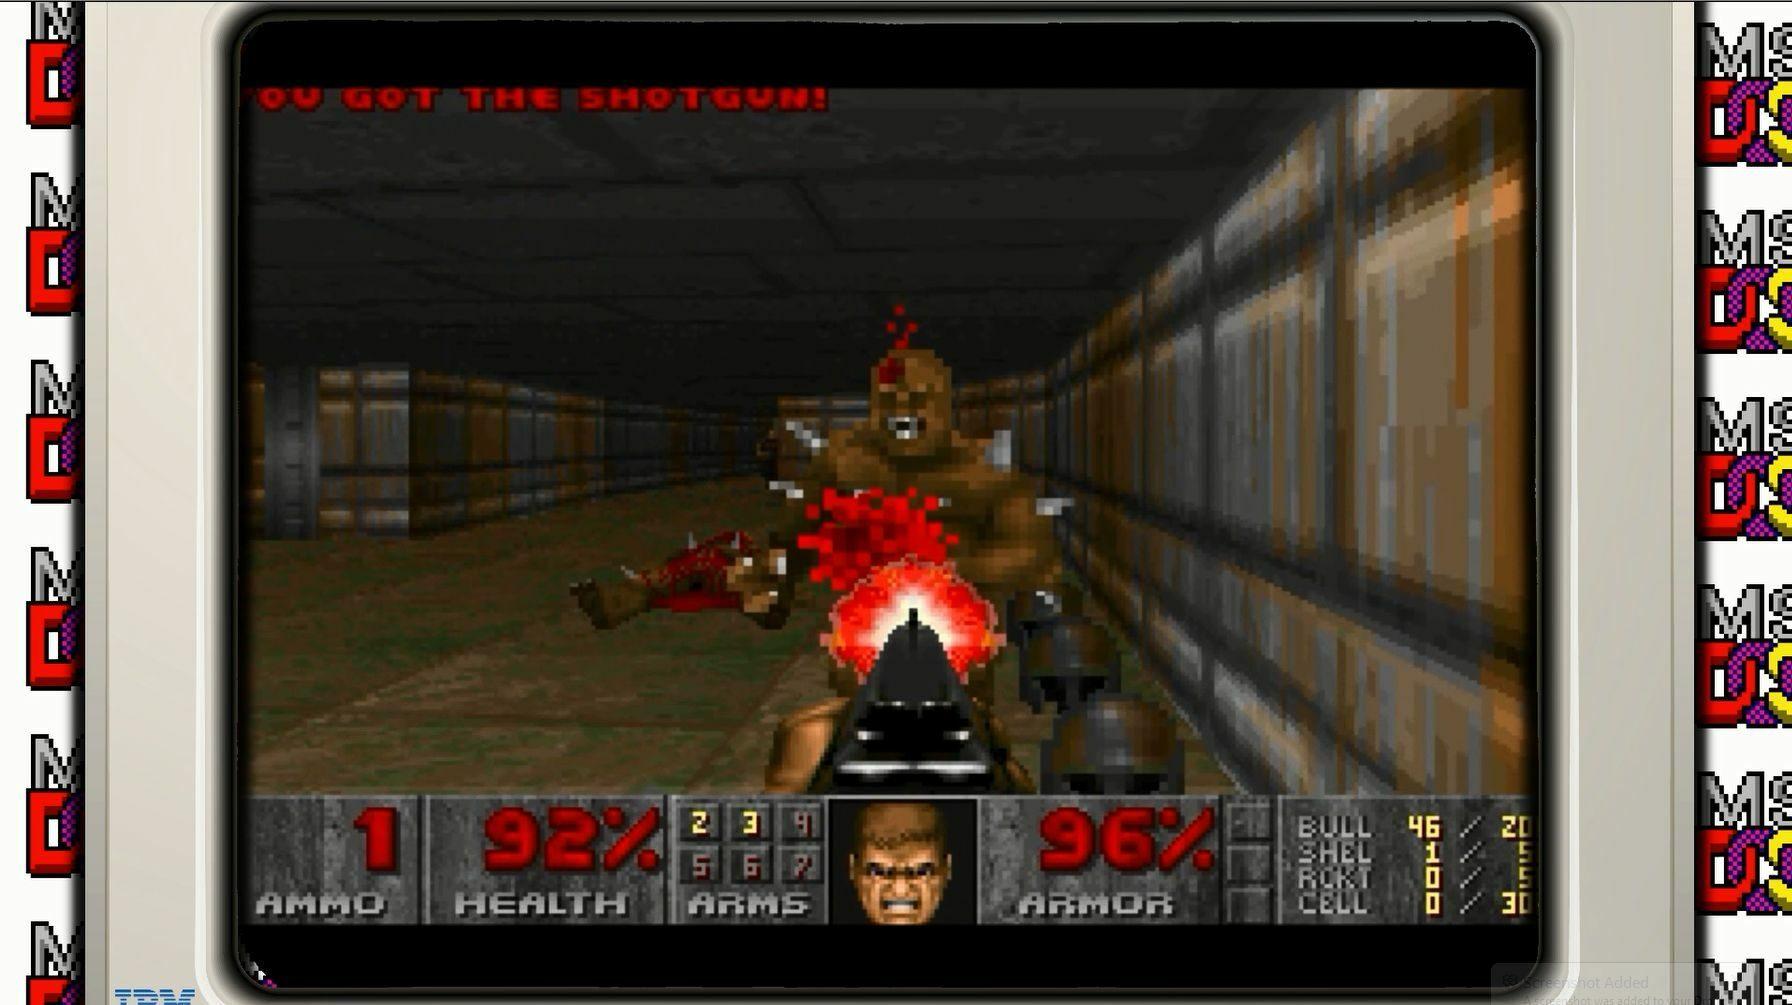 Top 7 MS-DOS Games - Nostalgia Nerd